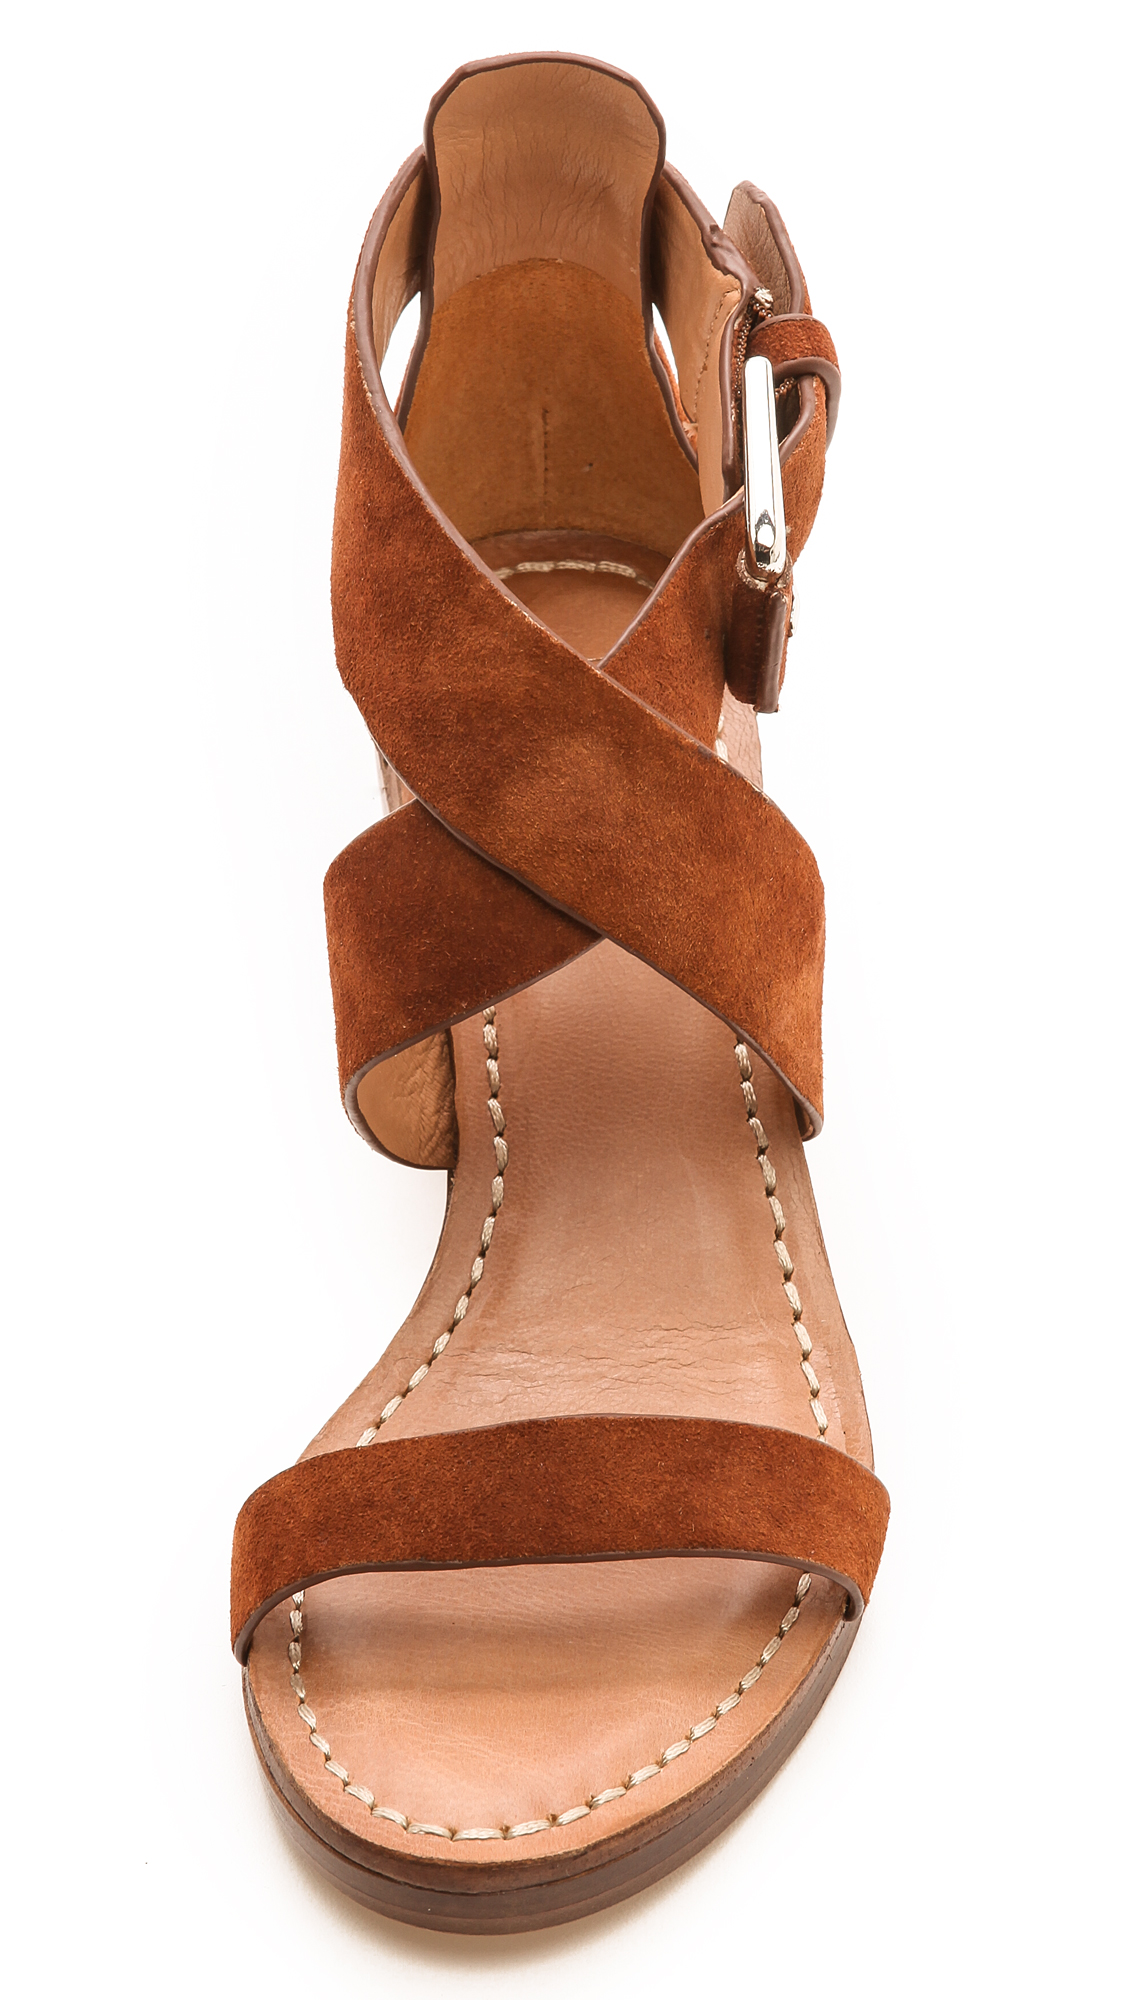 6158ebaa5fe Belle by Sigerson Morrison Afton Cross Strap Suede Sandals | SHOPBOP